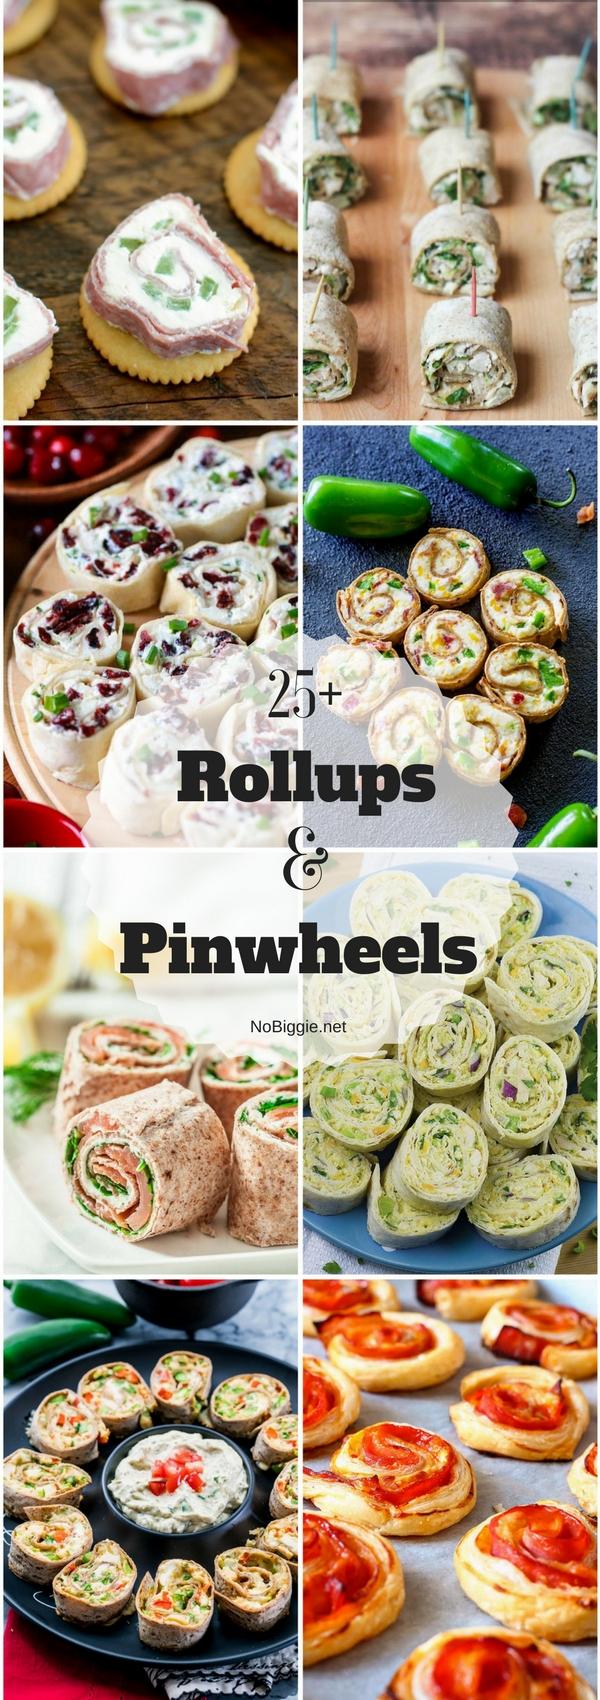 25+ Rollups and Pinwheels   NoBiggie.net